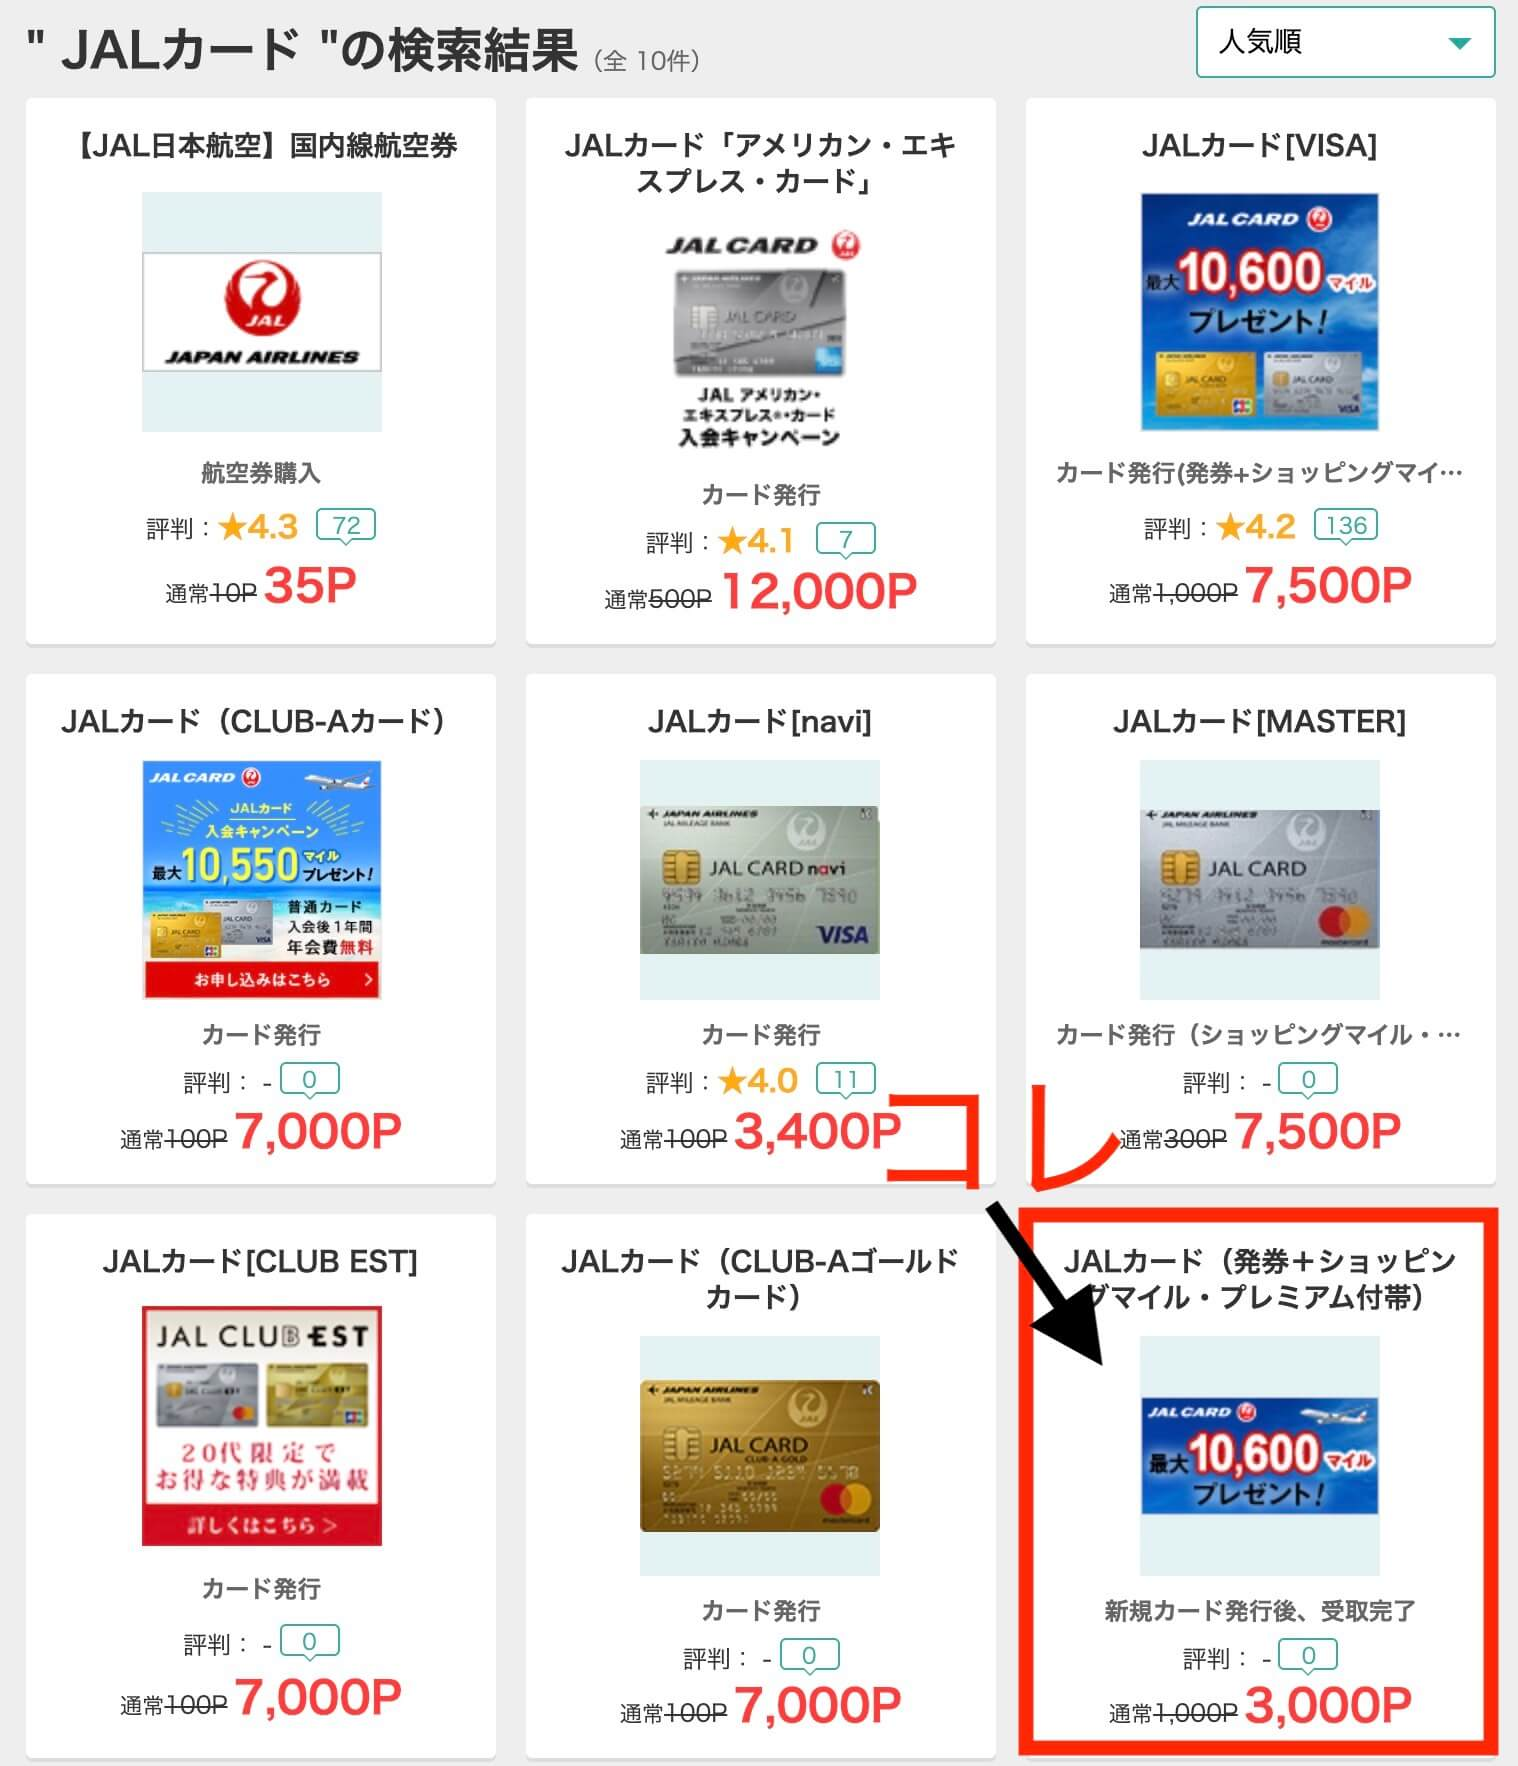 JALカードSuicaをポイントサイト経由で発行する方法